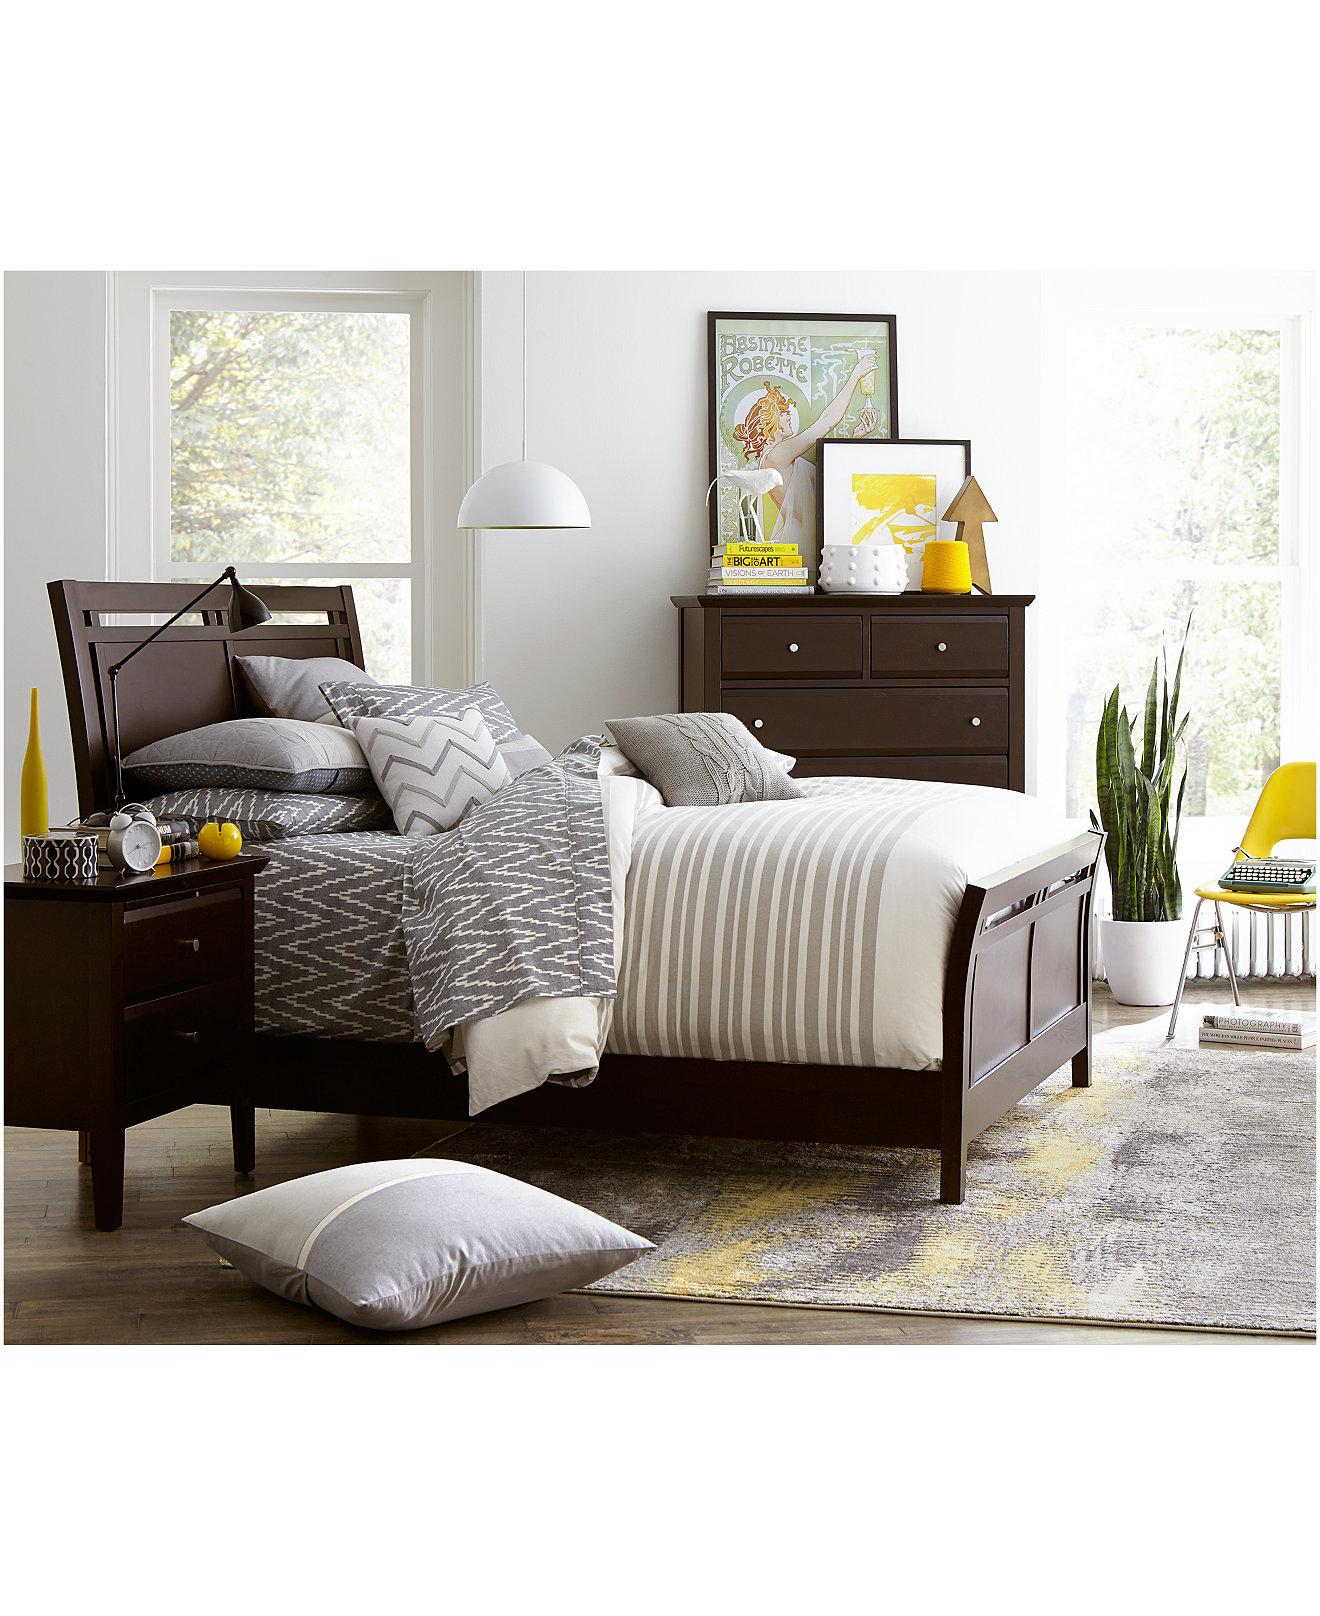 Lesley Bedroom Furniture Collection Loft Bed Shop For And Buy Loft Bed Online Macys